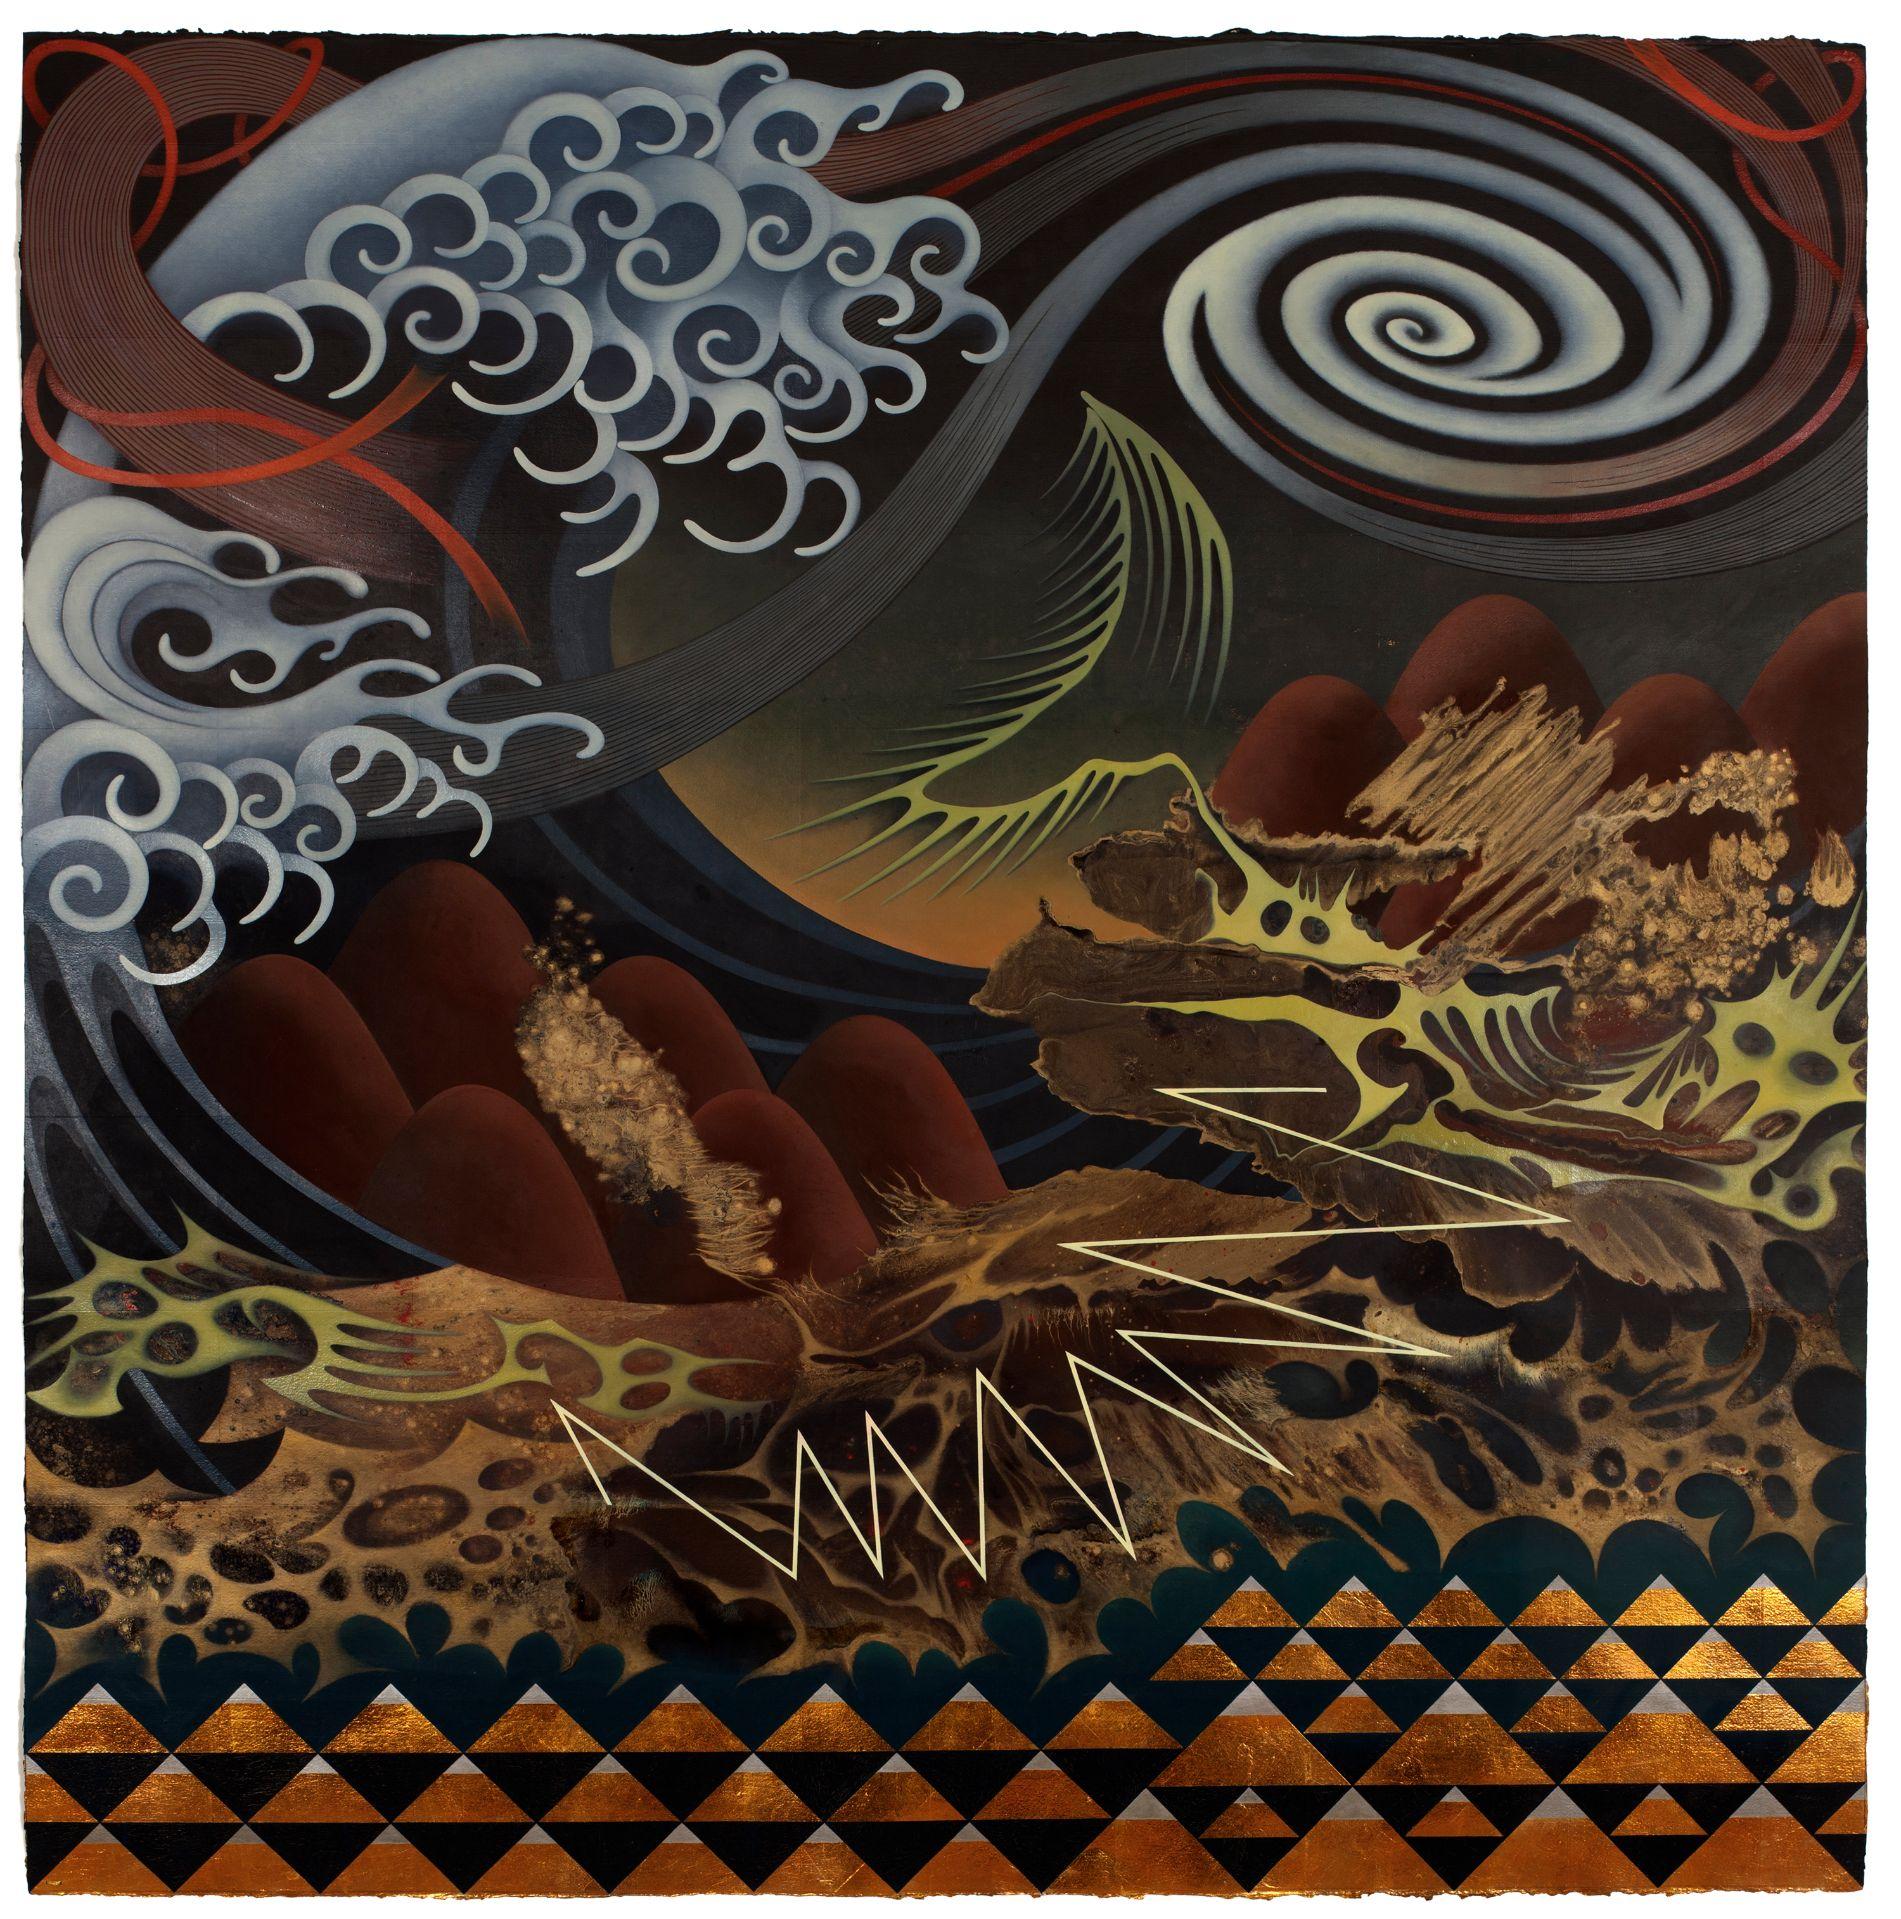 Connoisseur of Chaos, Takako Yamaguchi